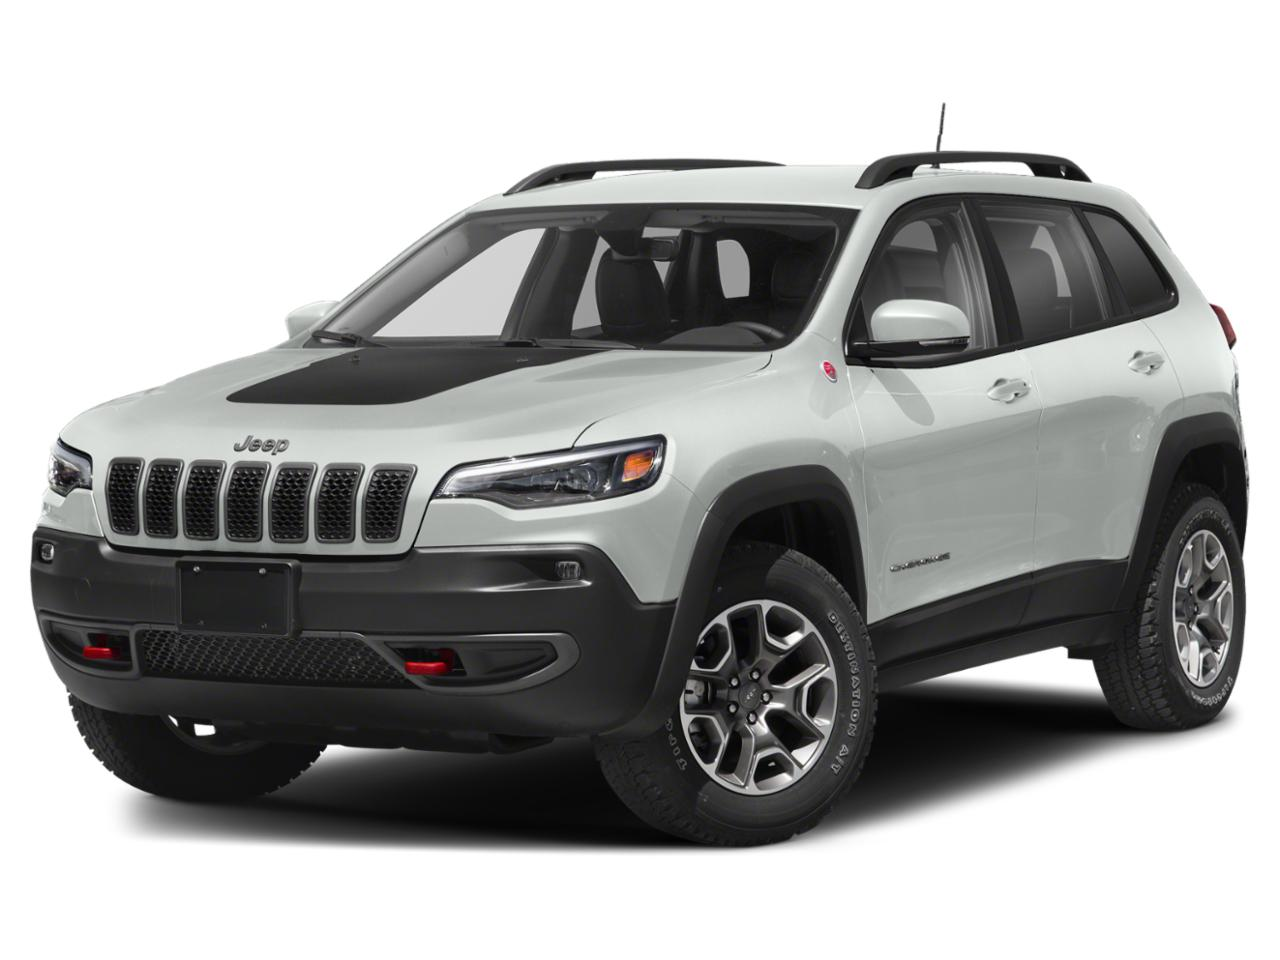 2020 Jeep Cherokee Vehicle Photo in Colma, CA 94014